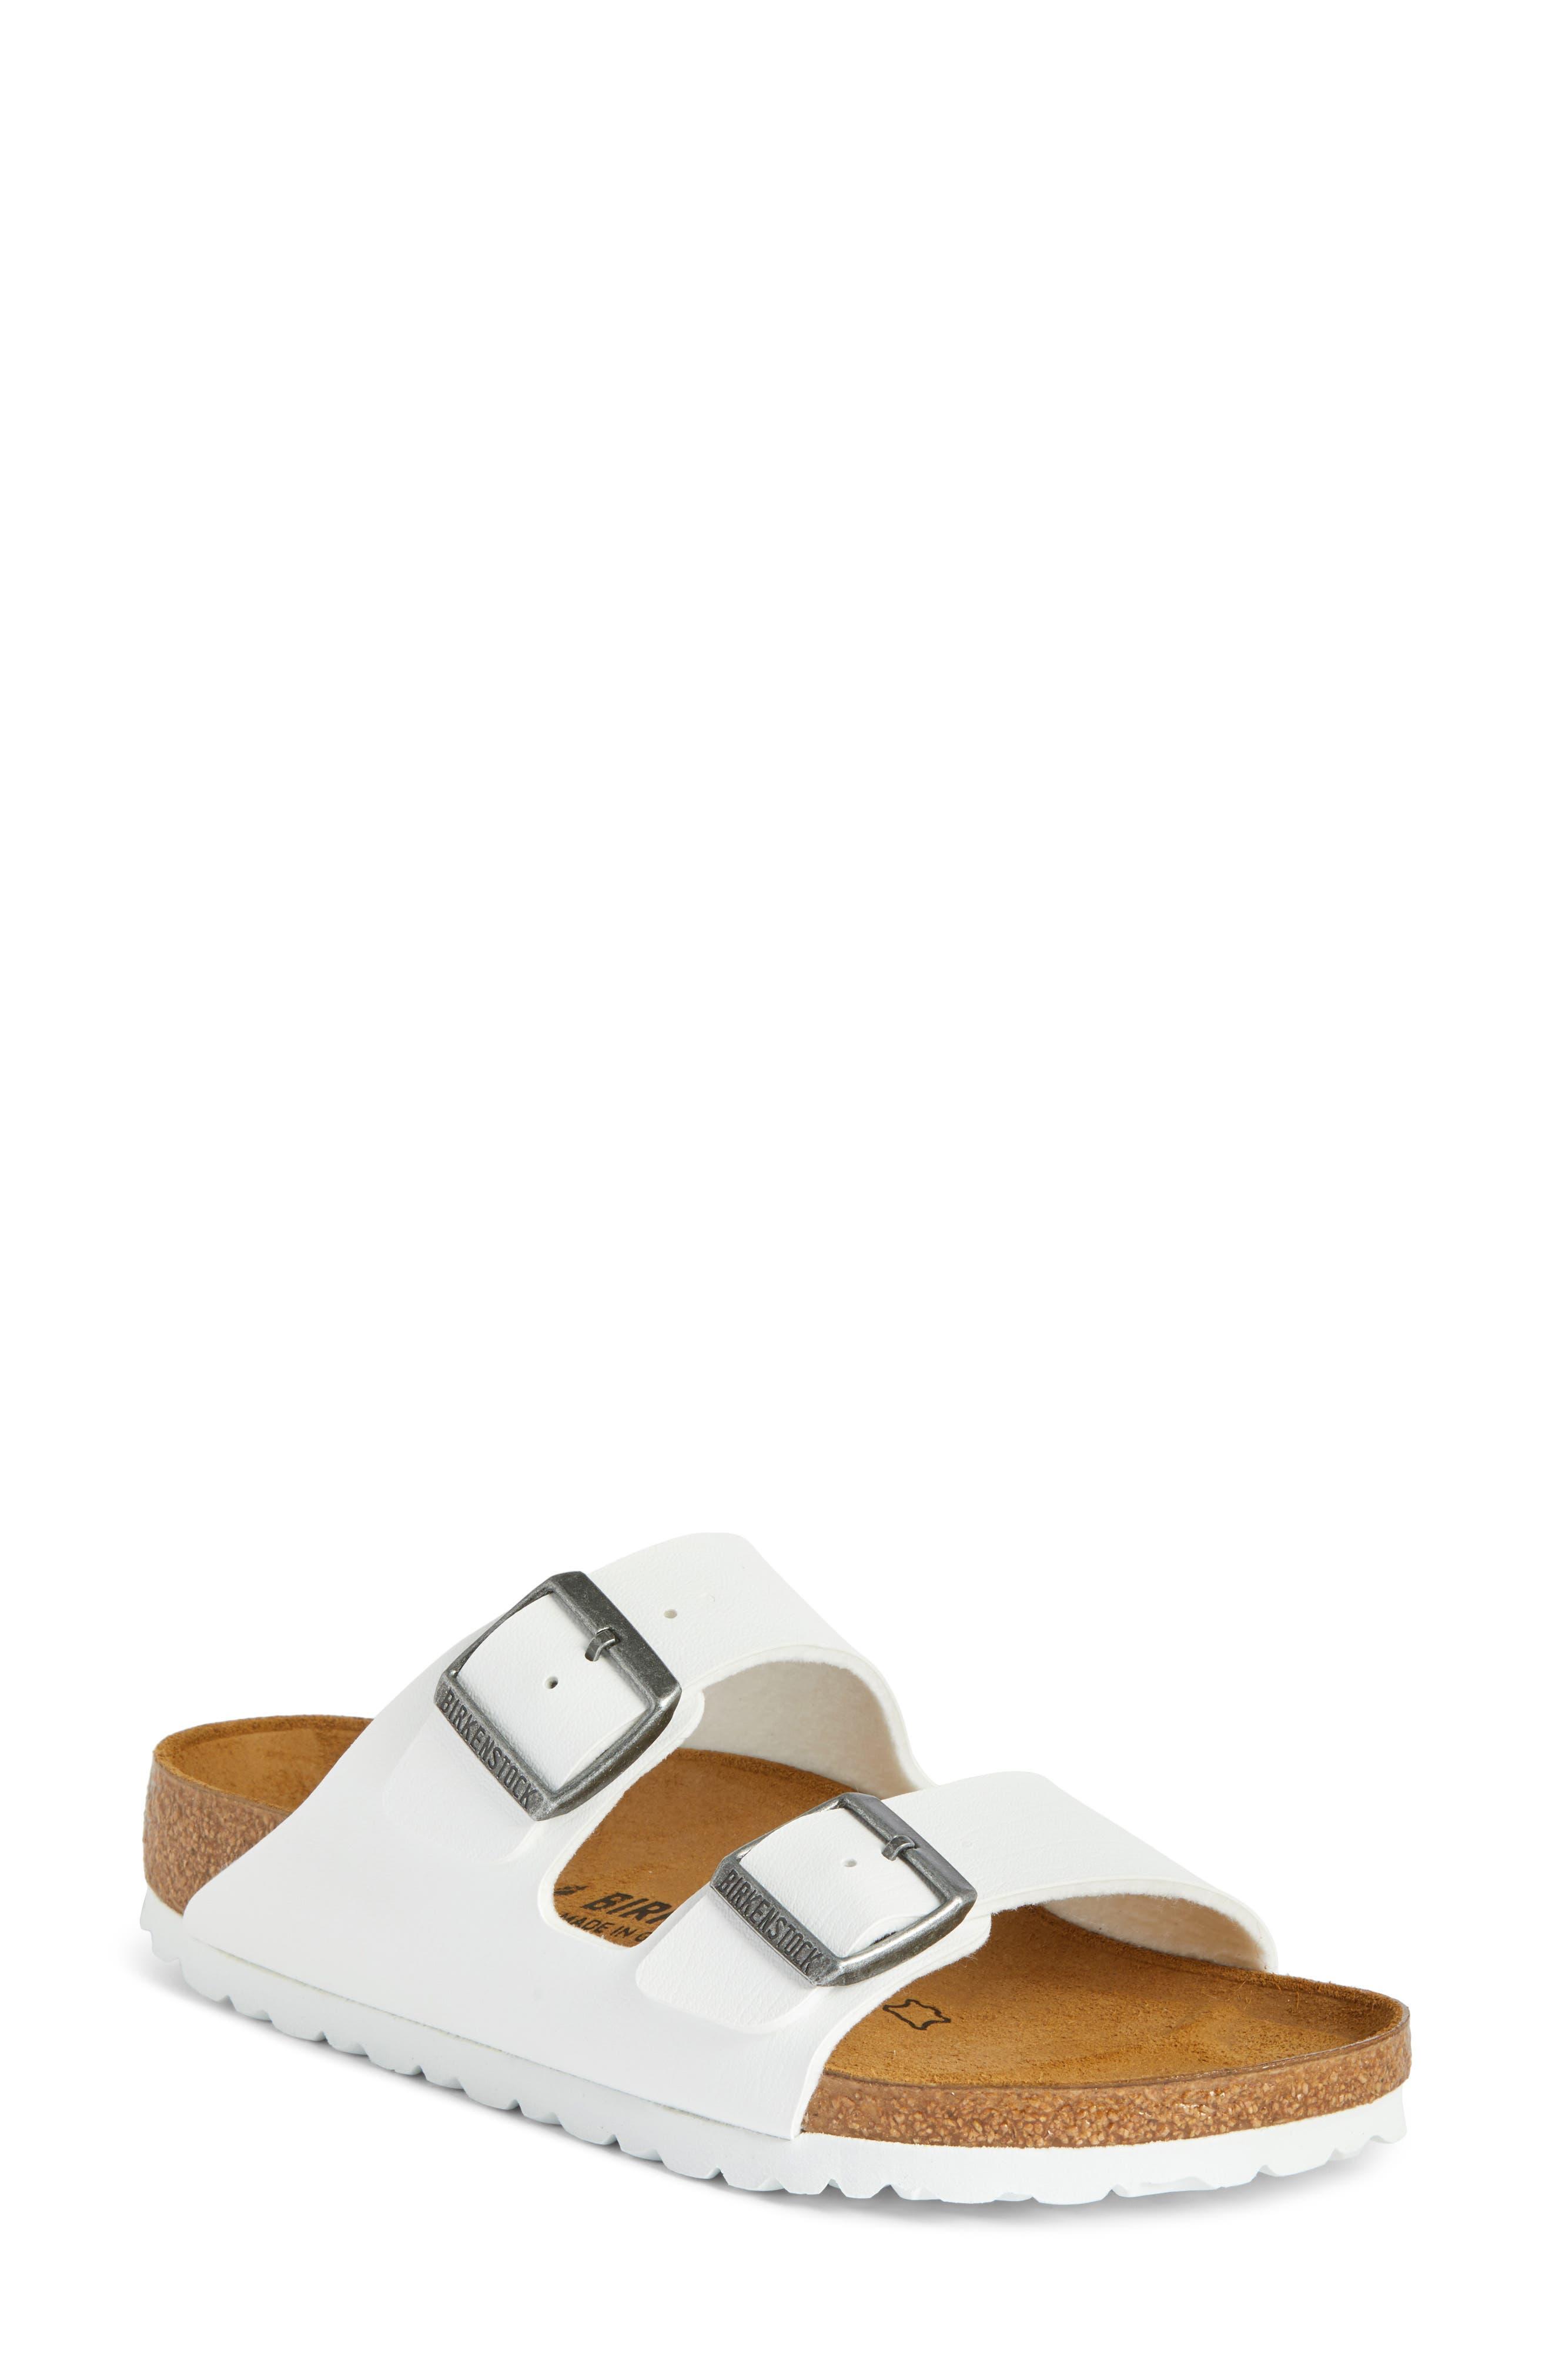 'Arizona' White Birko-Flor Sandal, Main, color, WHITE SYNTHETIC LEATHER